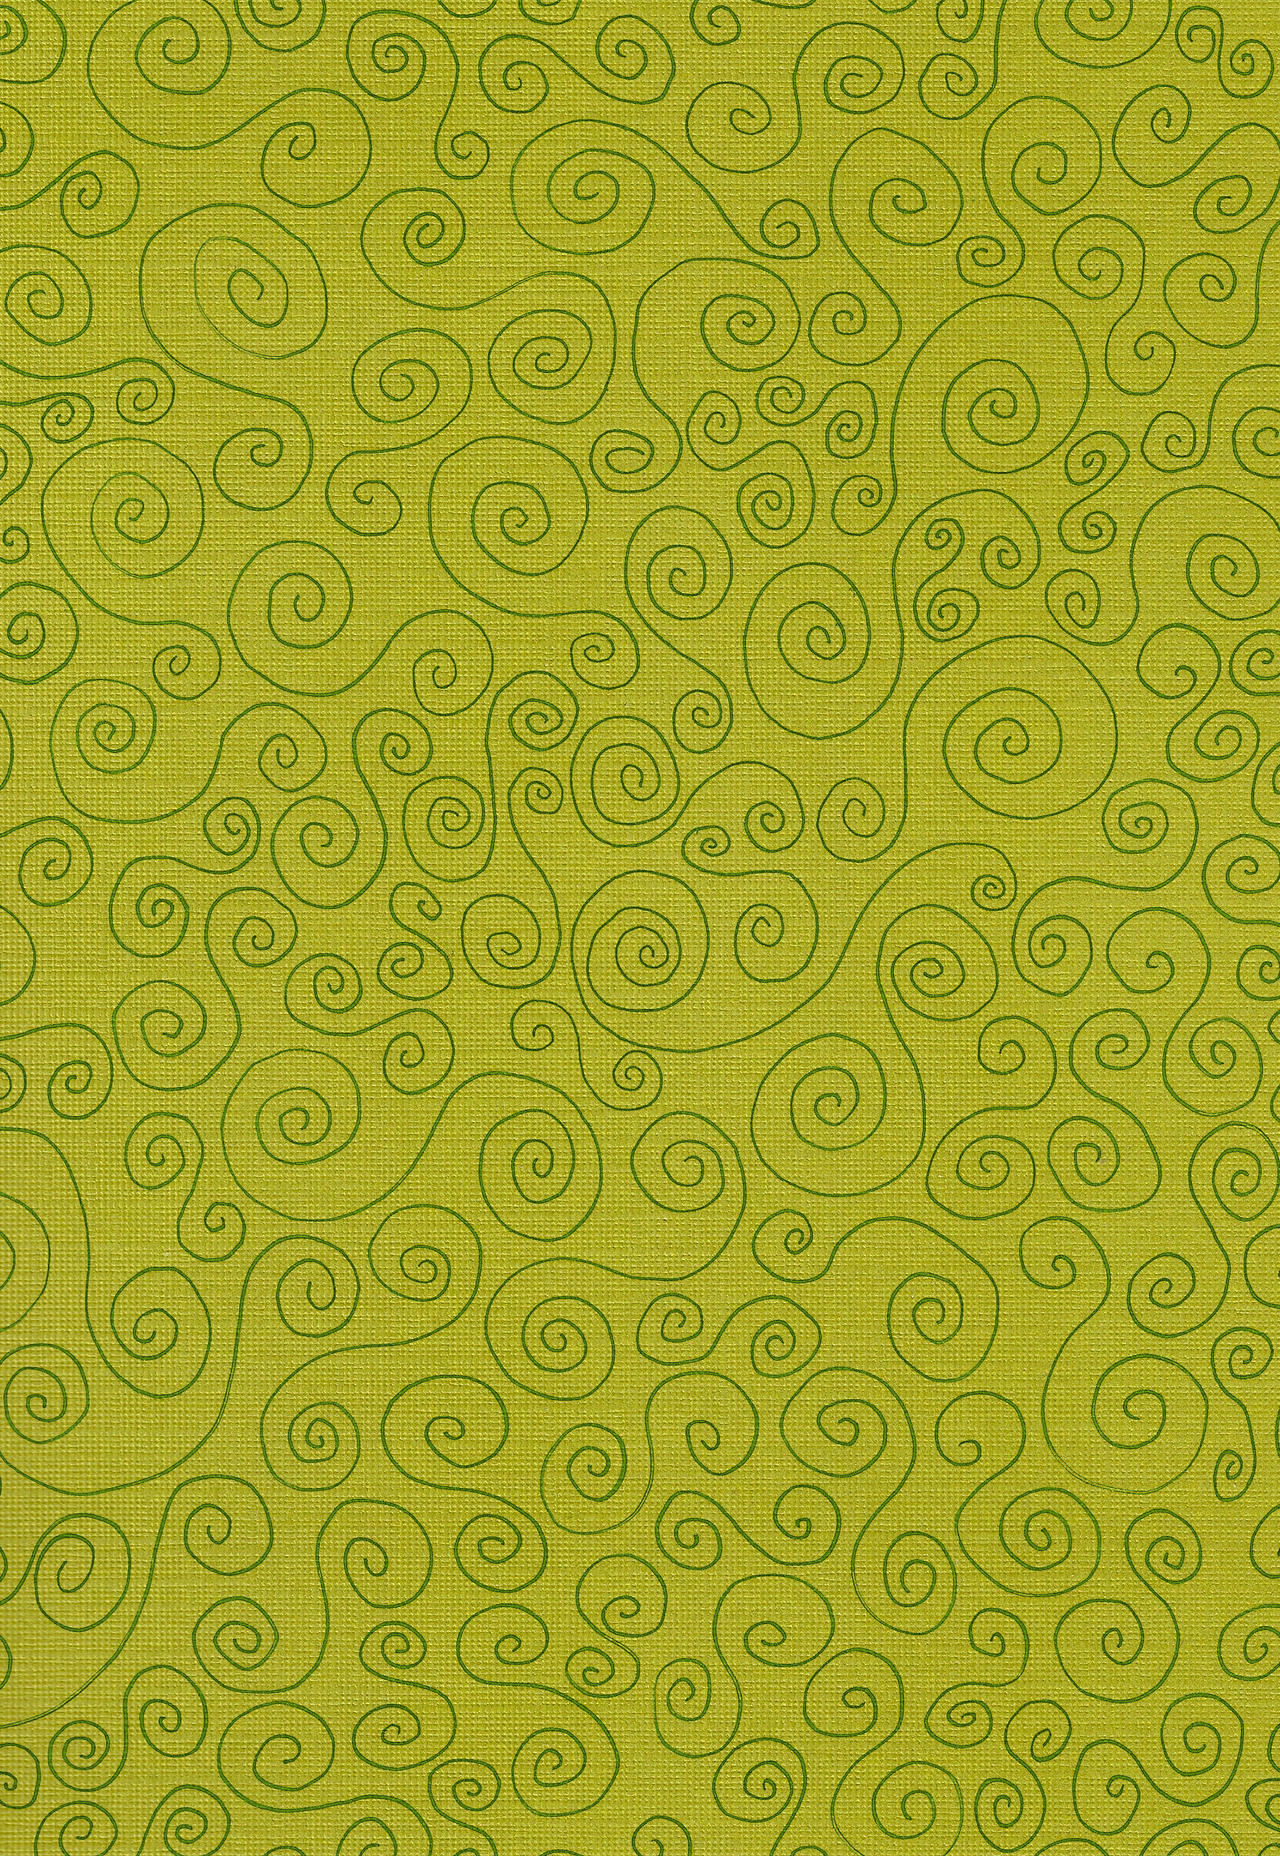 Texture - Green Swirls Paper